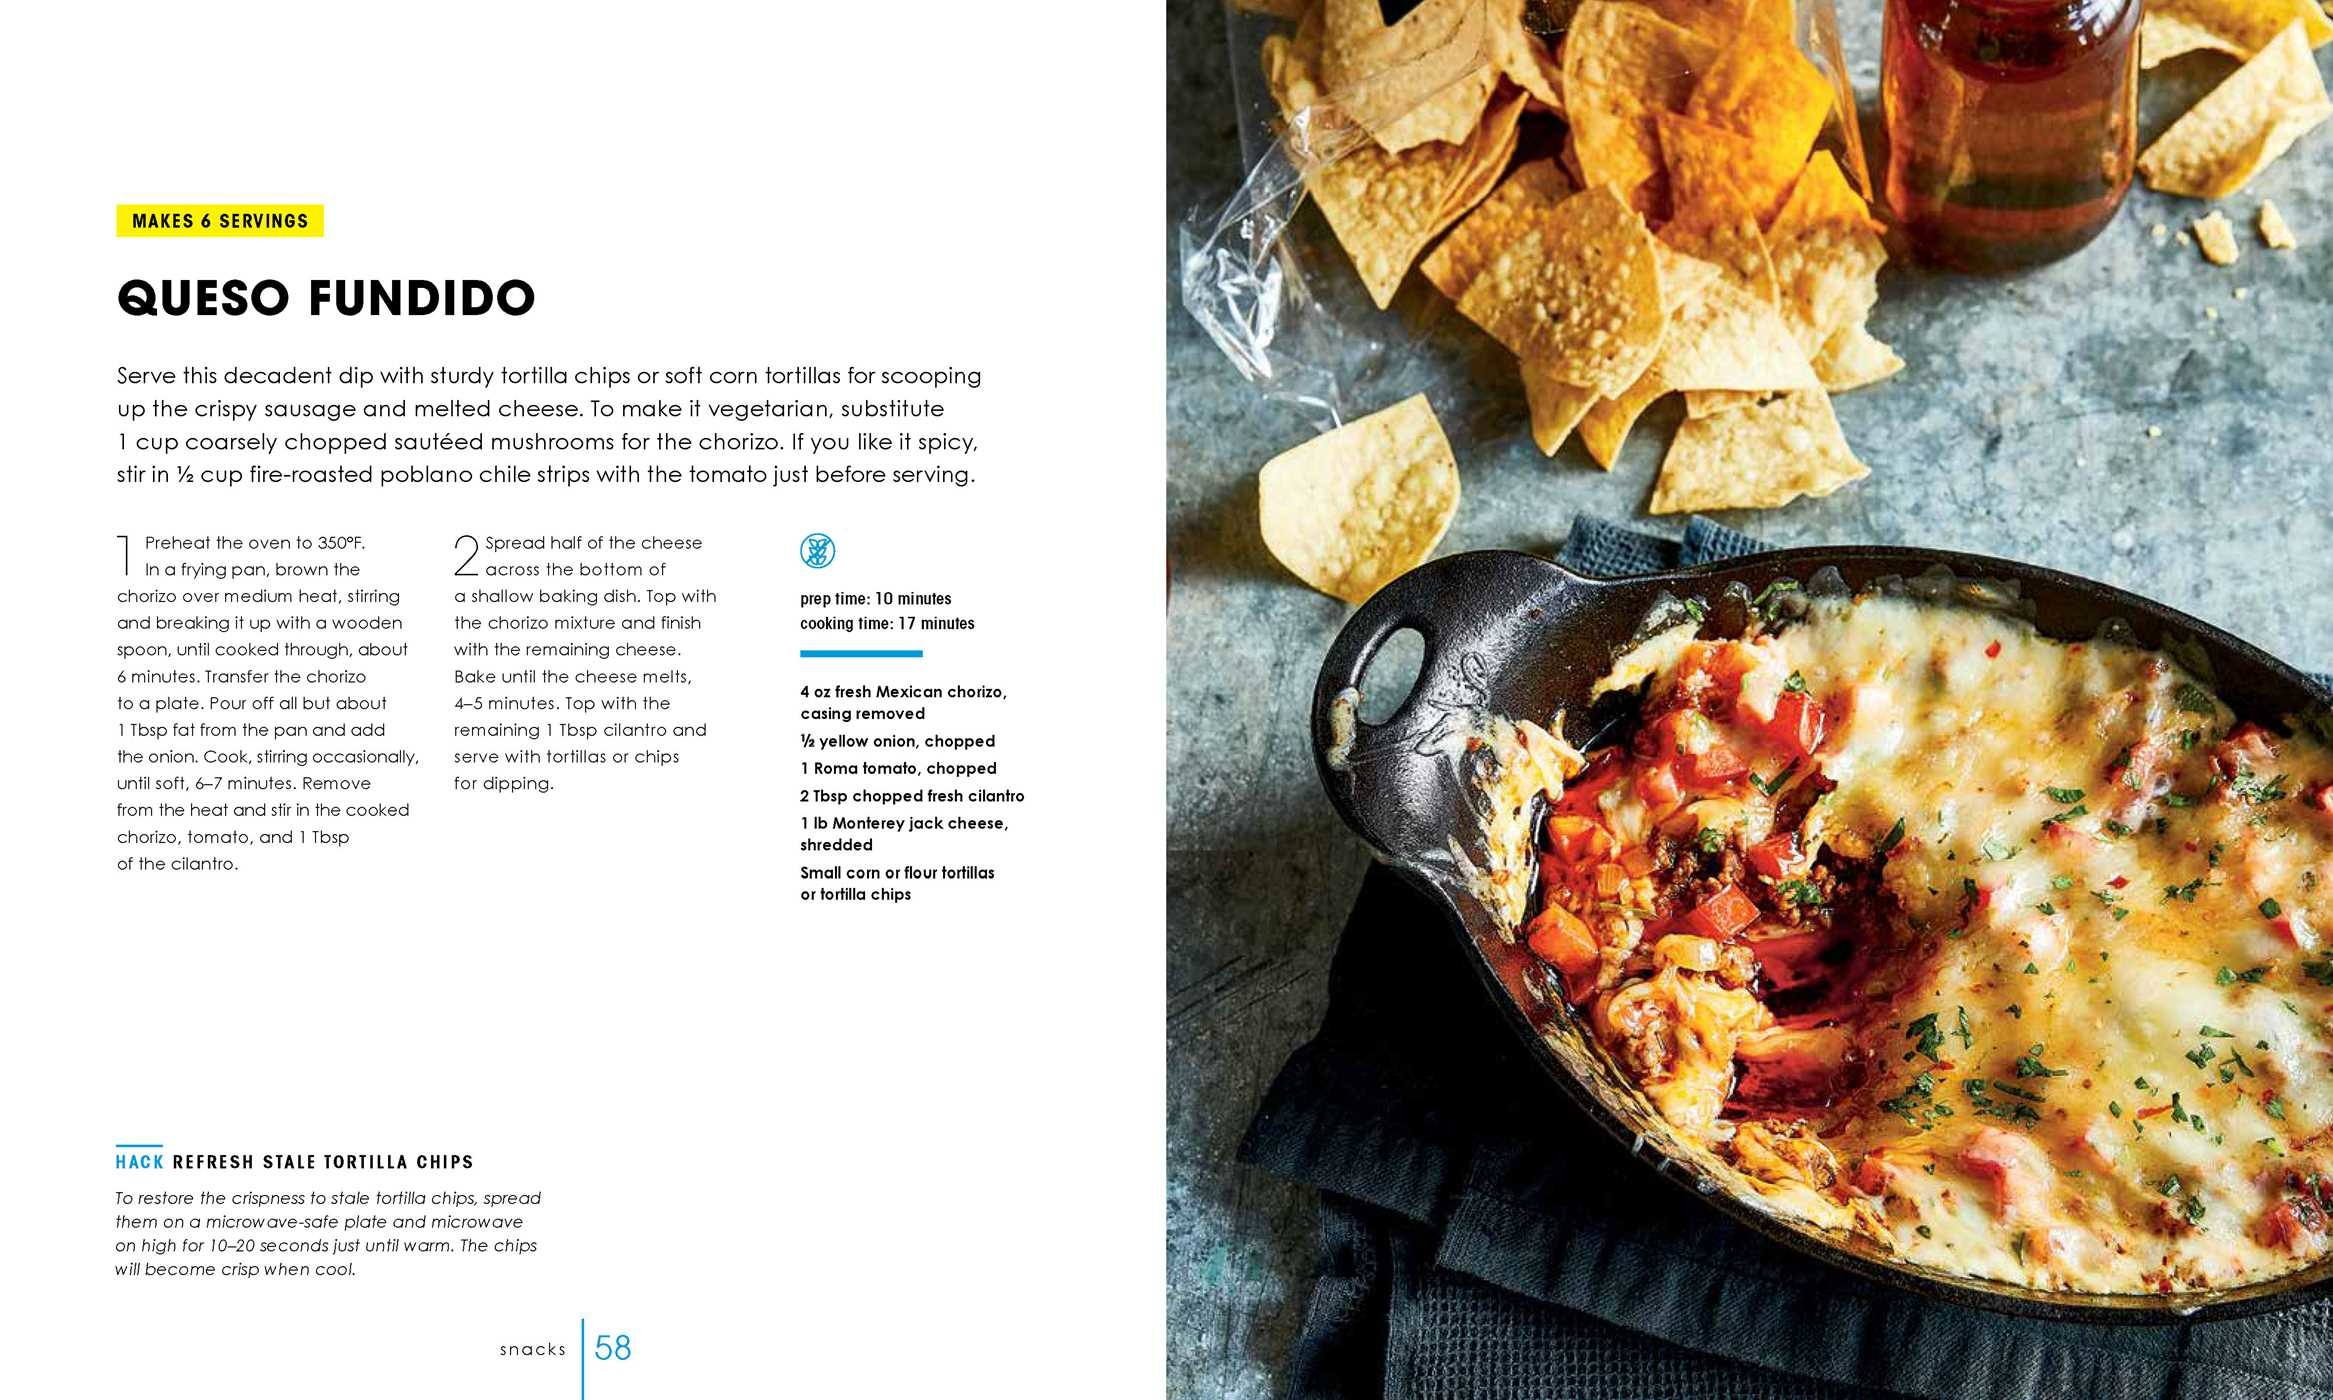 The college cookbook 9781681884363.in04